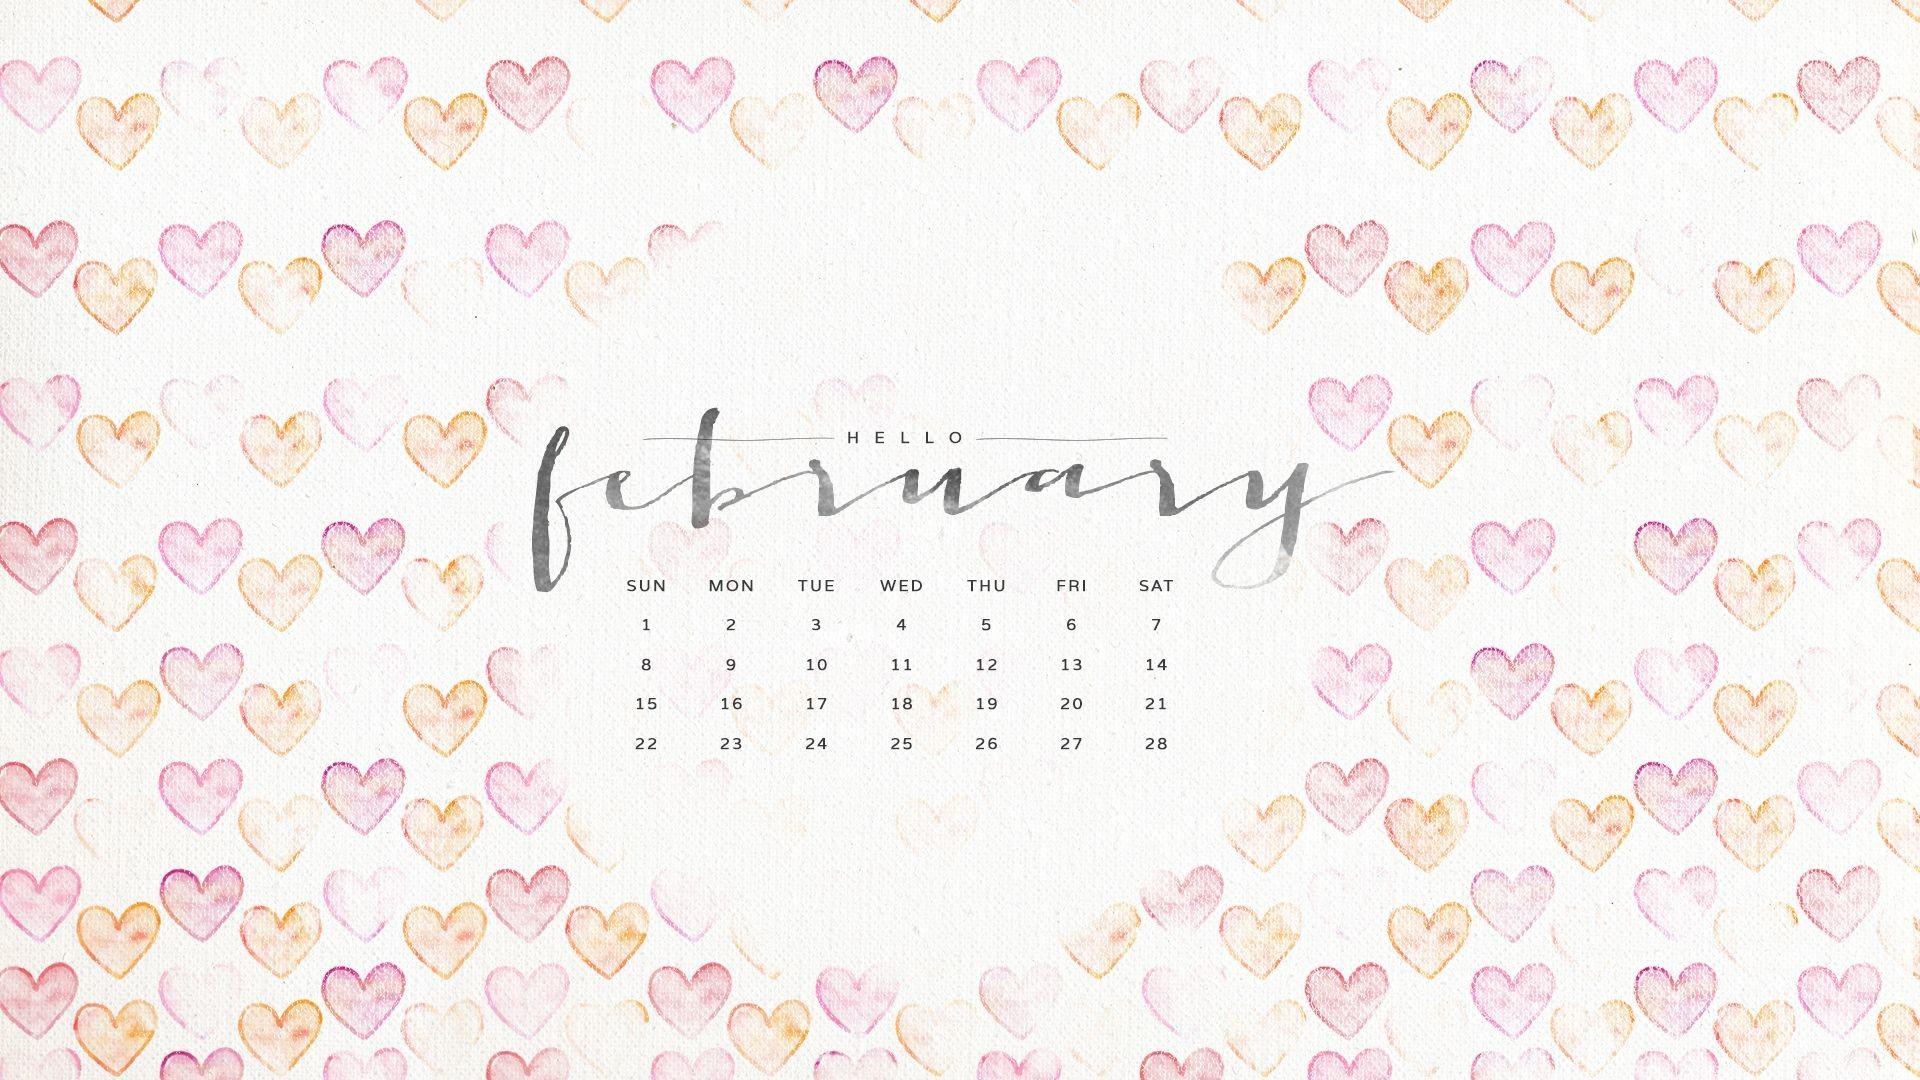 Valentines February Calendar Wallpaper Sarah Hearts